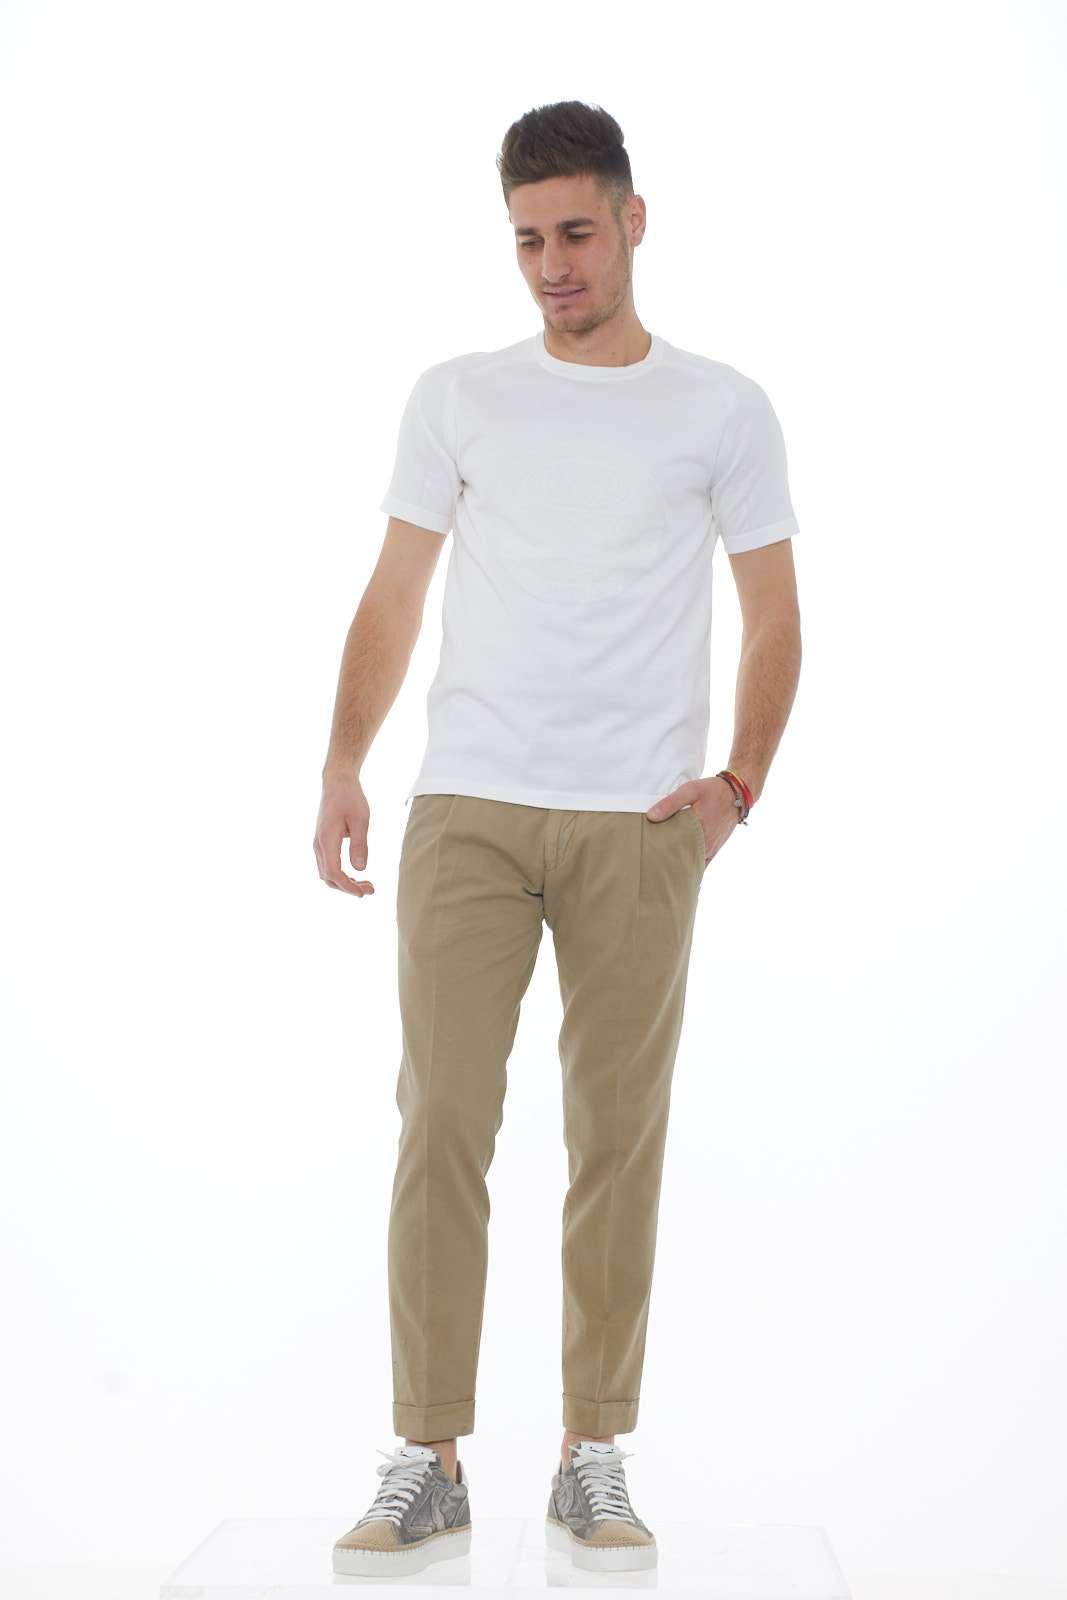 https://www.parmax.com/media/catalog/product/a/i/PE-outlet_parmax-pantaloni-uomo-FREDERICK3340-D.jpg